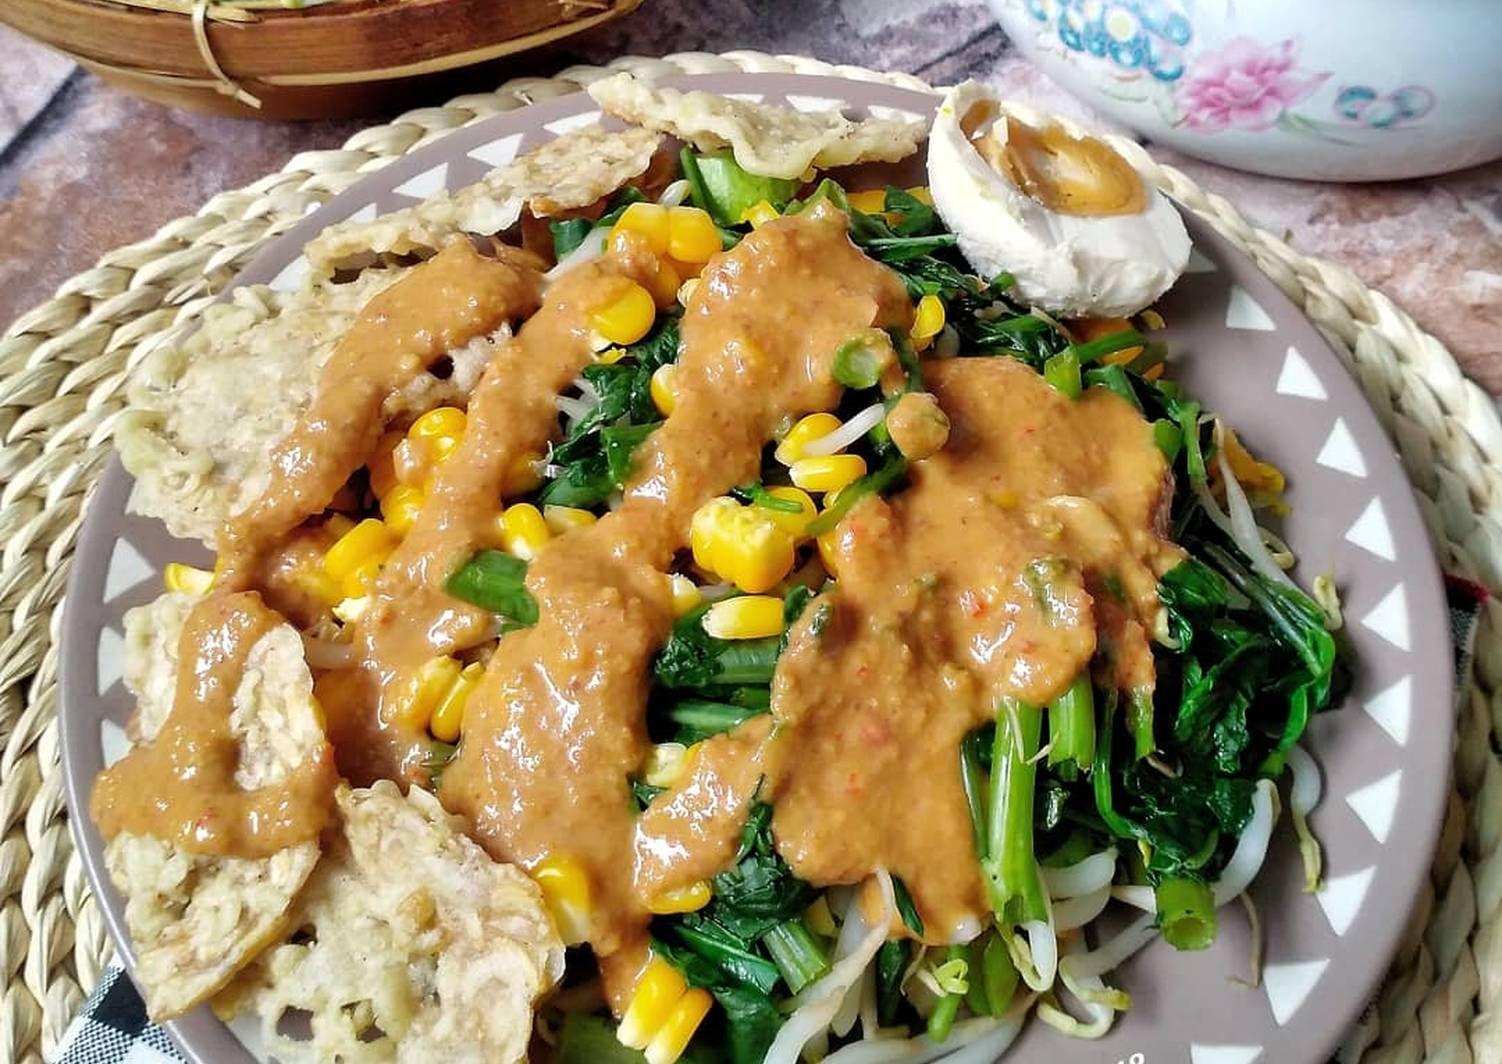 Resep Gado Gado Siram Oleh Susan Mellyani Resep Resep Rebusan Kacang